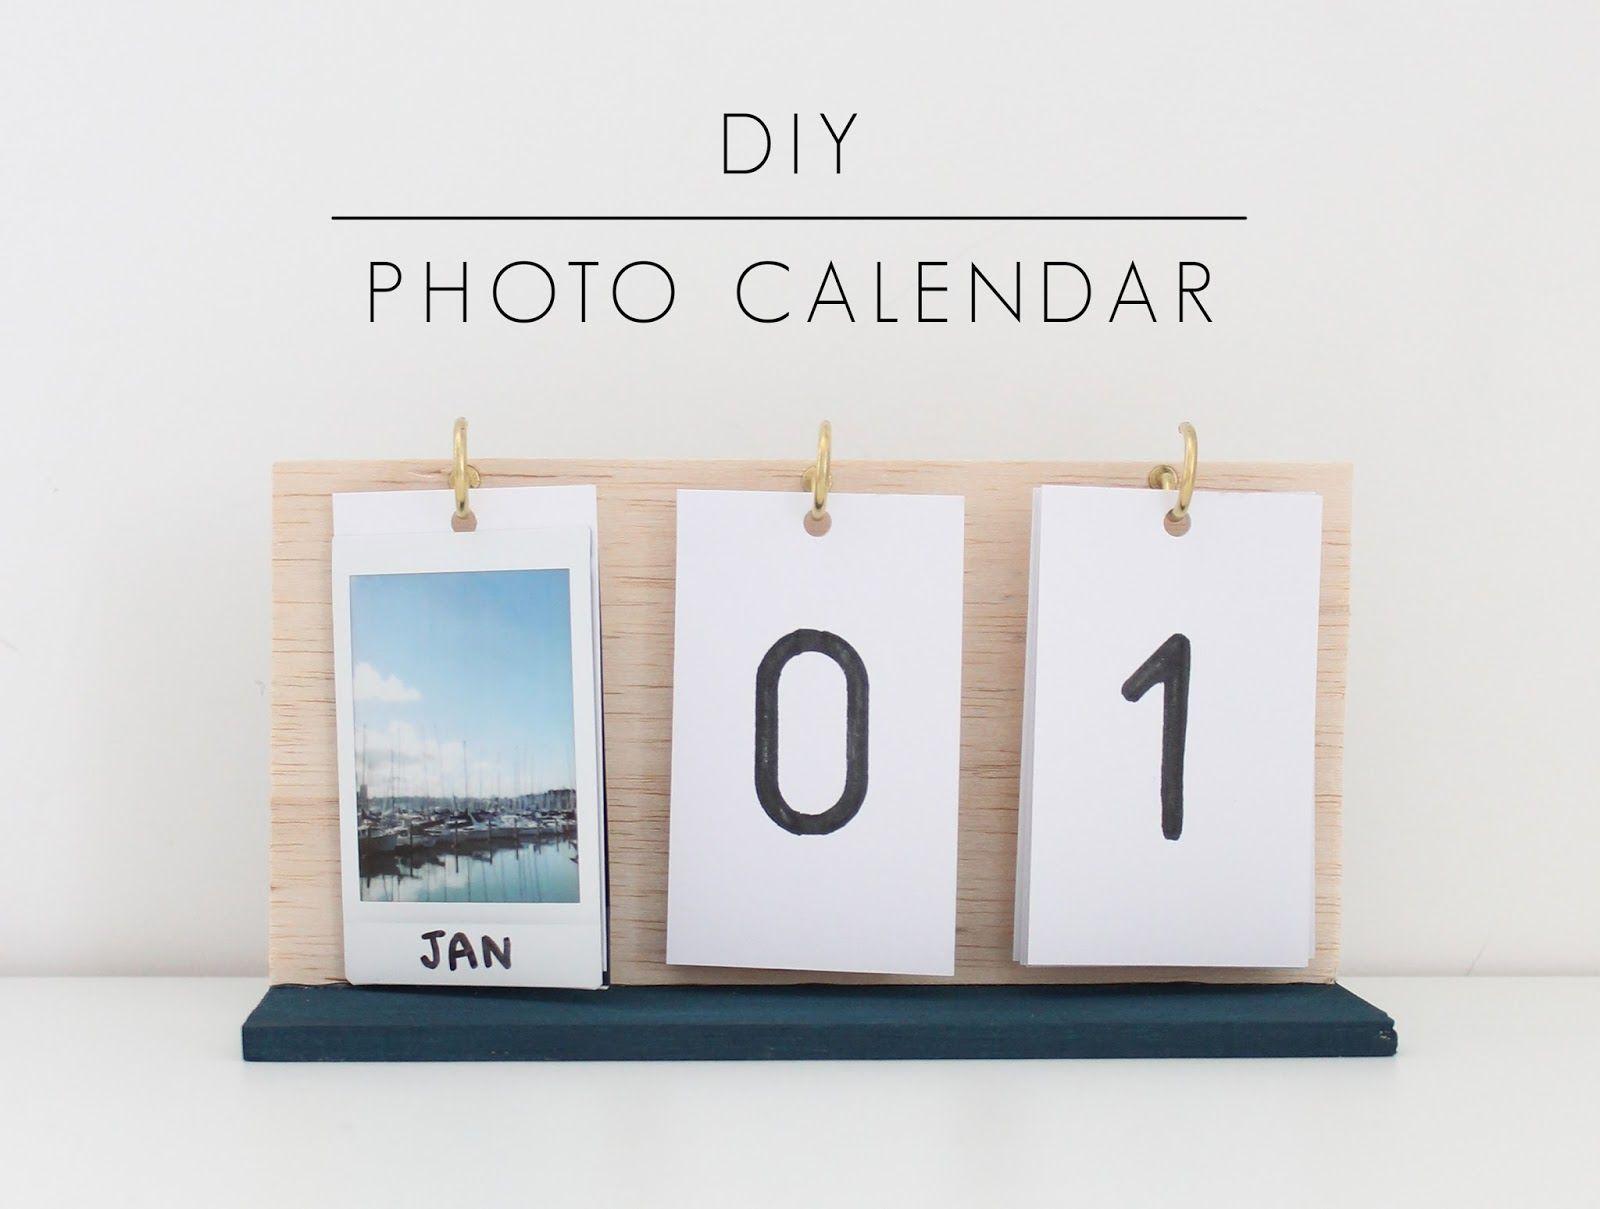 Do It Yourself Kalender Diy Kalender Ideen Diy Babykarte Mit May